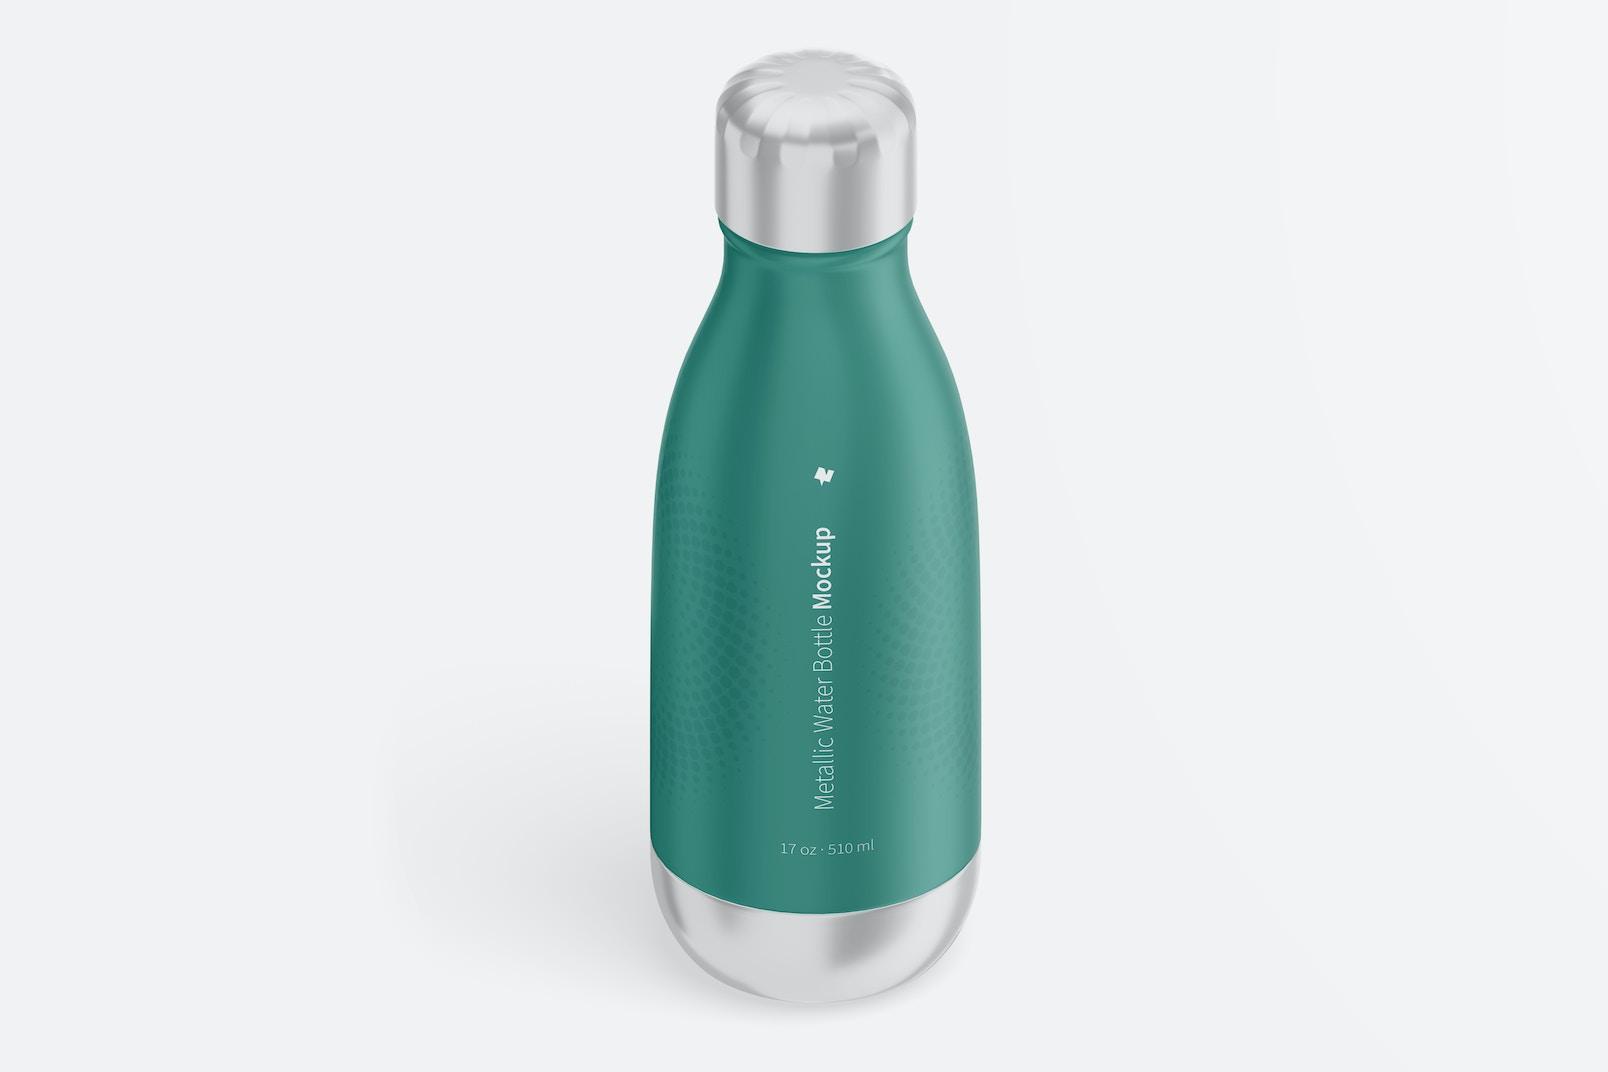 17 oz Metallic Water Bottles Mockup, Isometric View